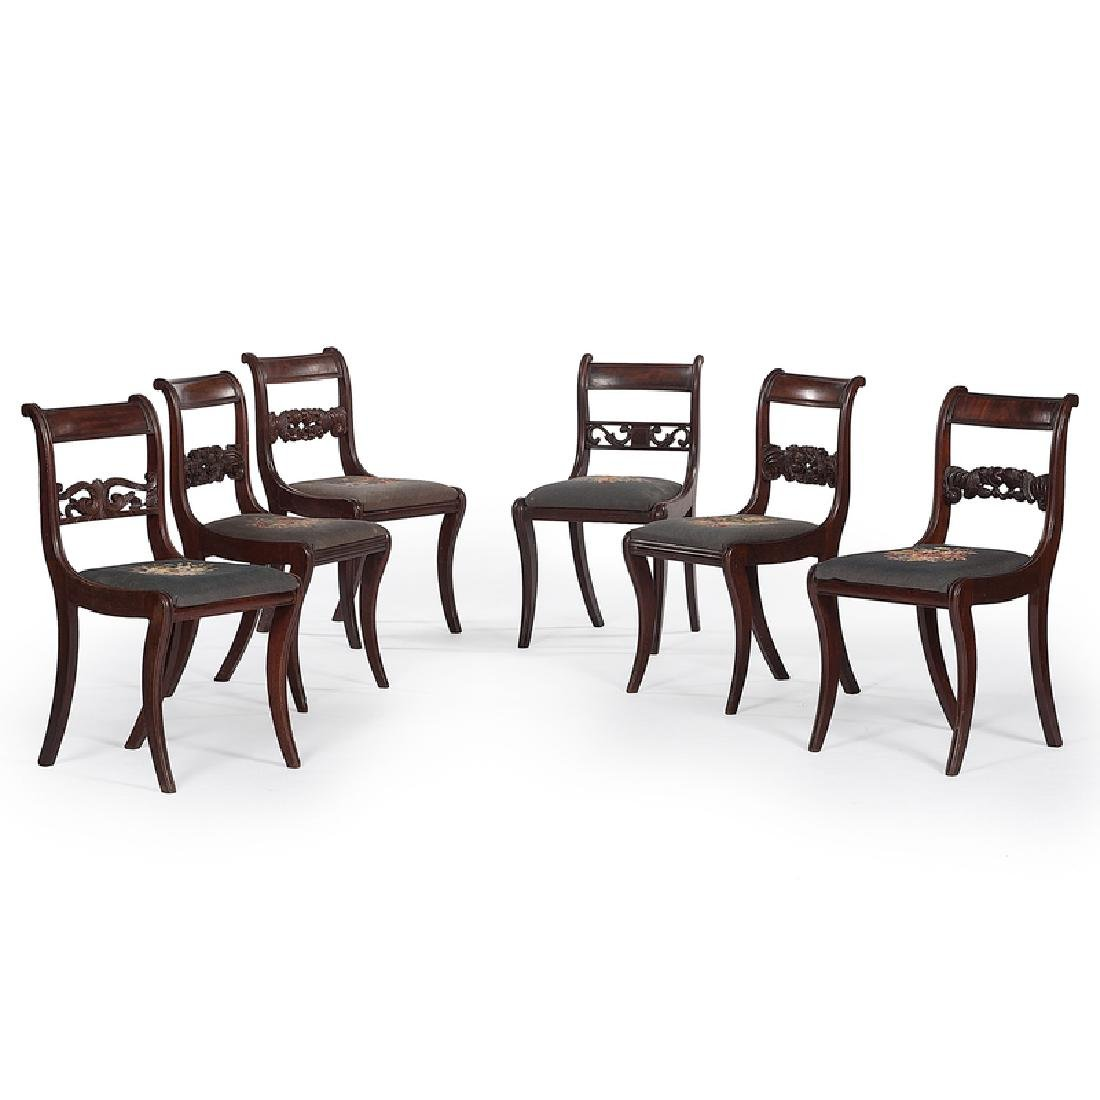 Classical Mahogany Chairs